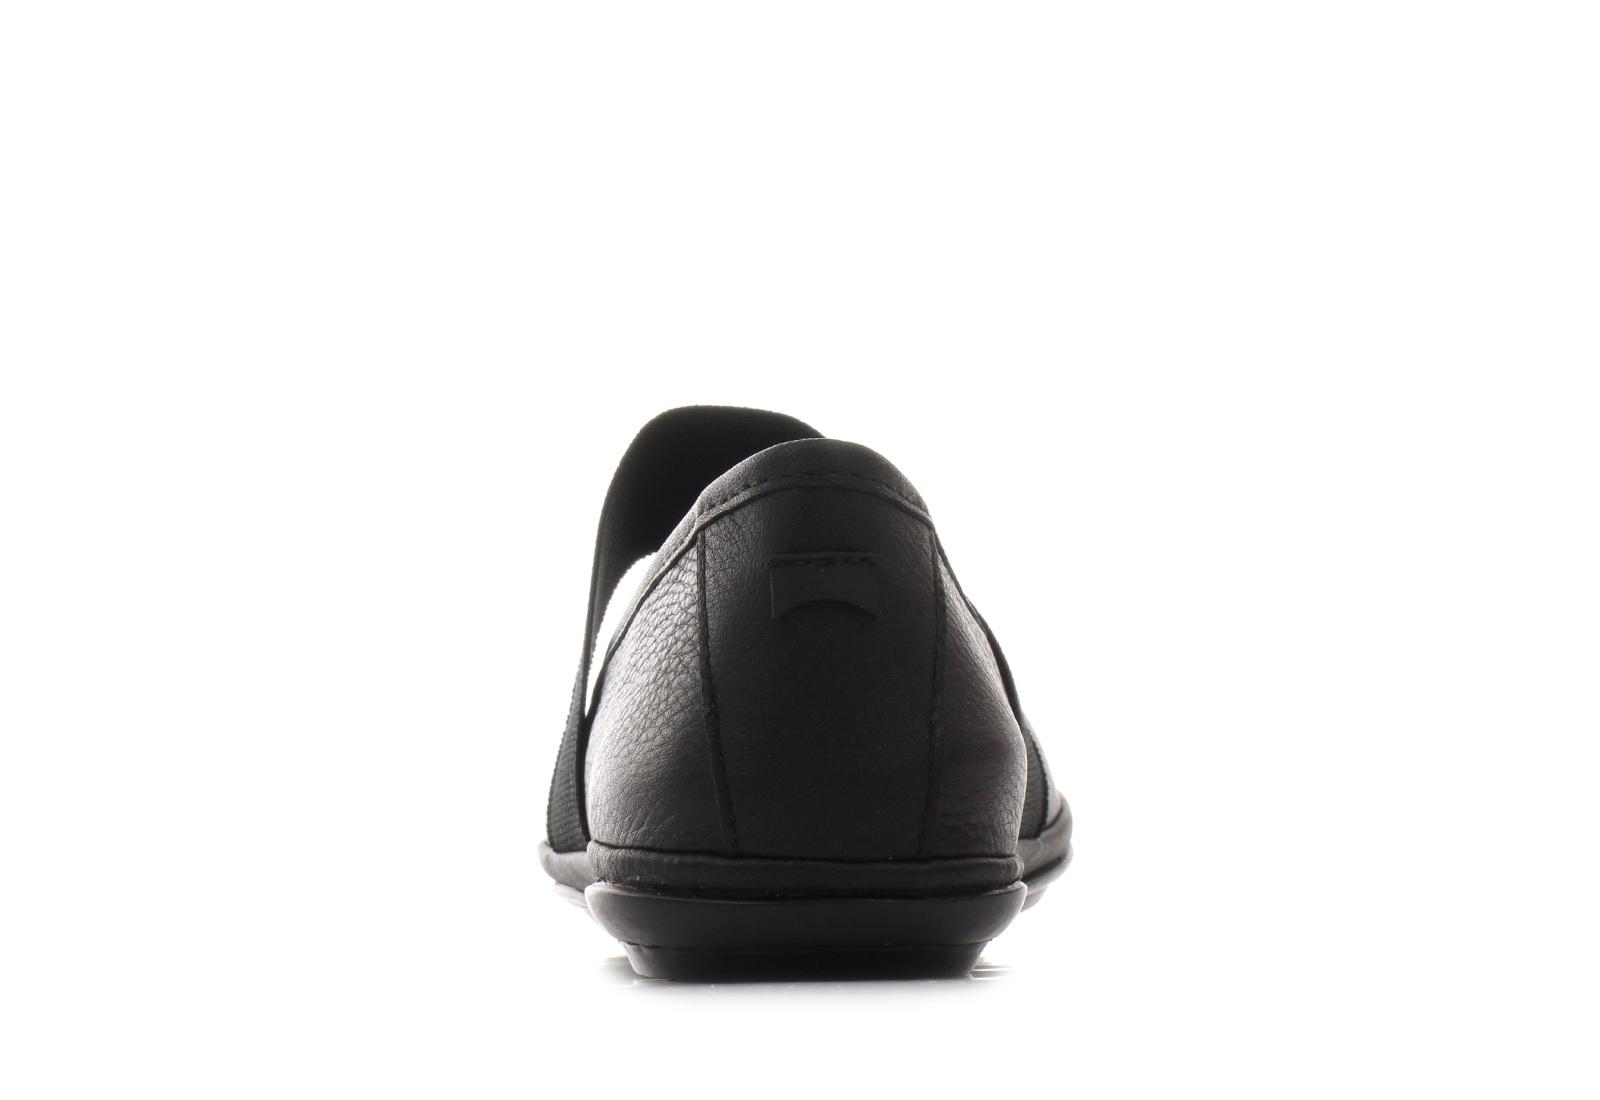 f6c6ff25a4 Camper Cipő - Right Nina - 21595-018 - Office Shoes Magyarország